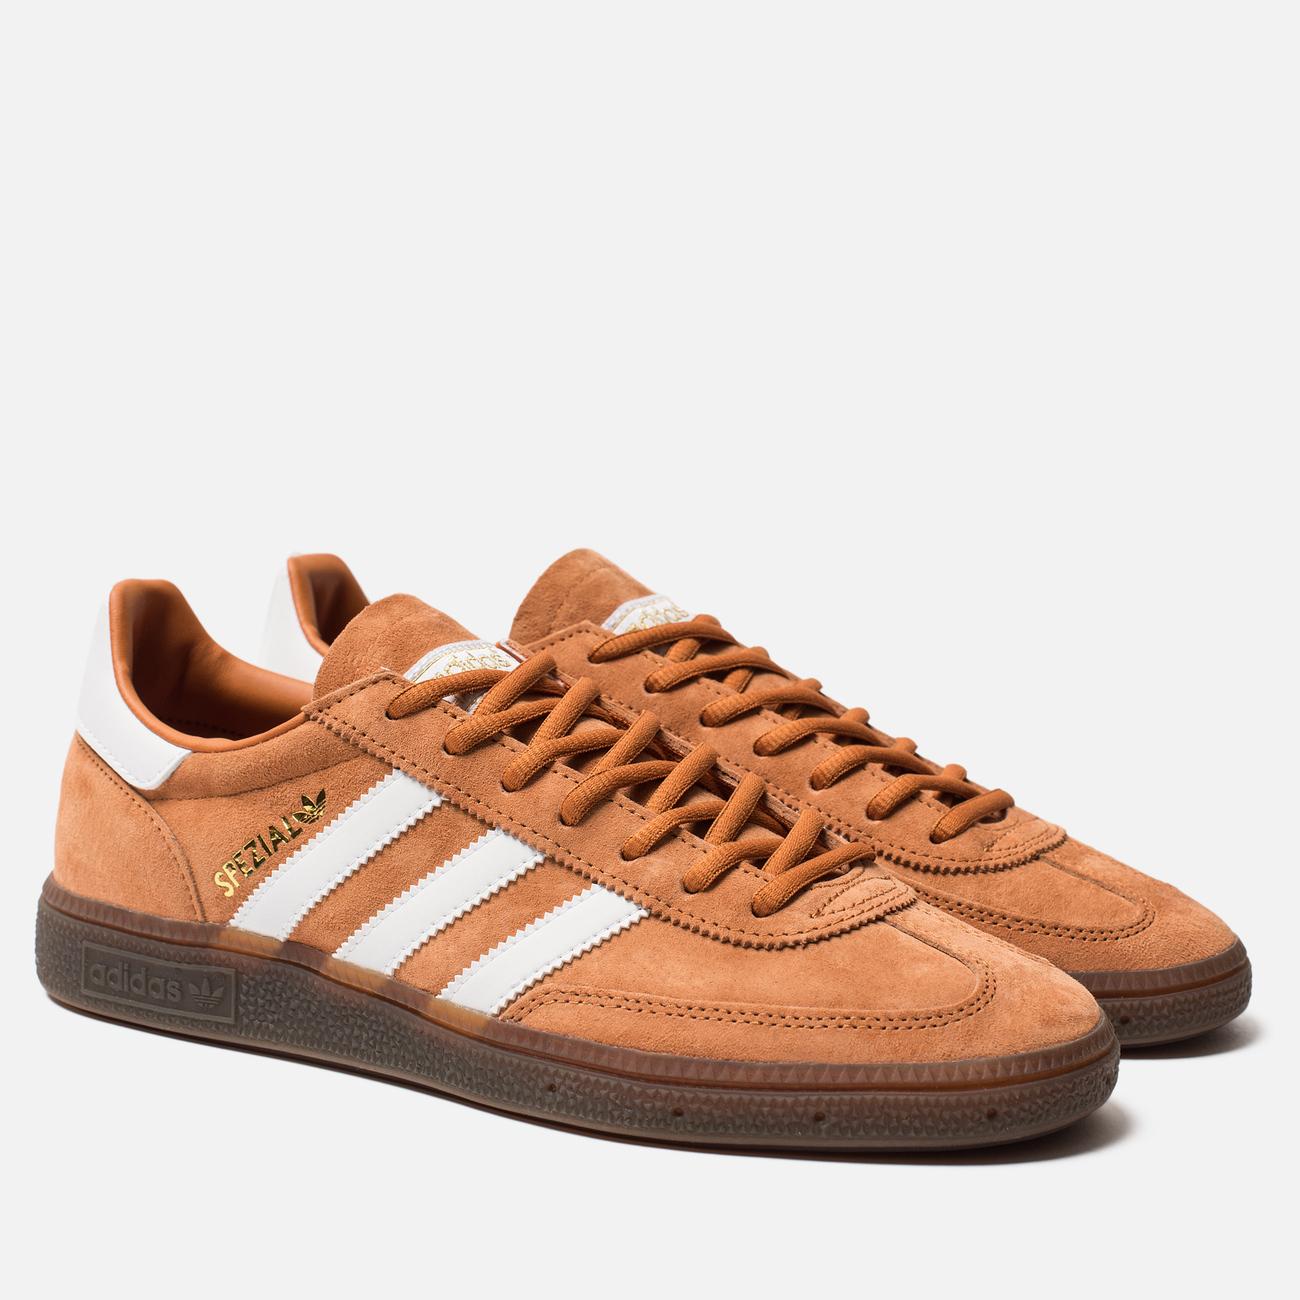 Кроссовки adidas Originals Handball Spezial Tech Copper/Cloud White/Gold Metallic